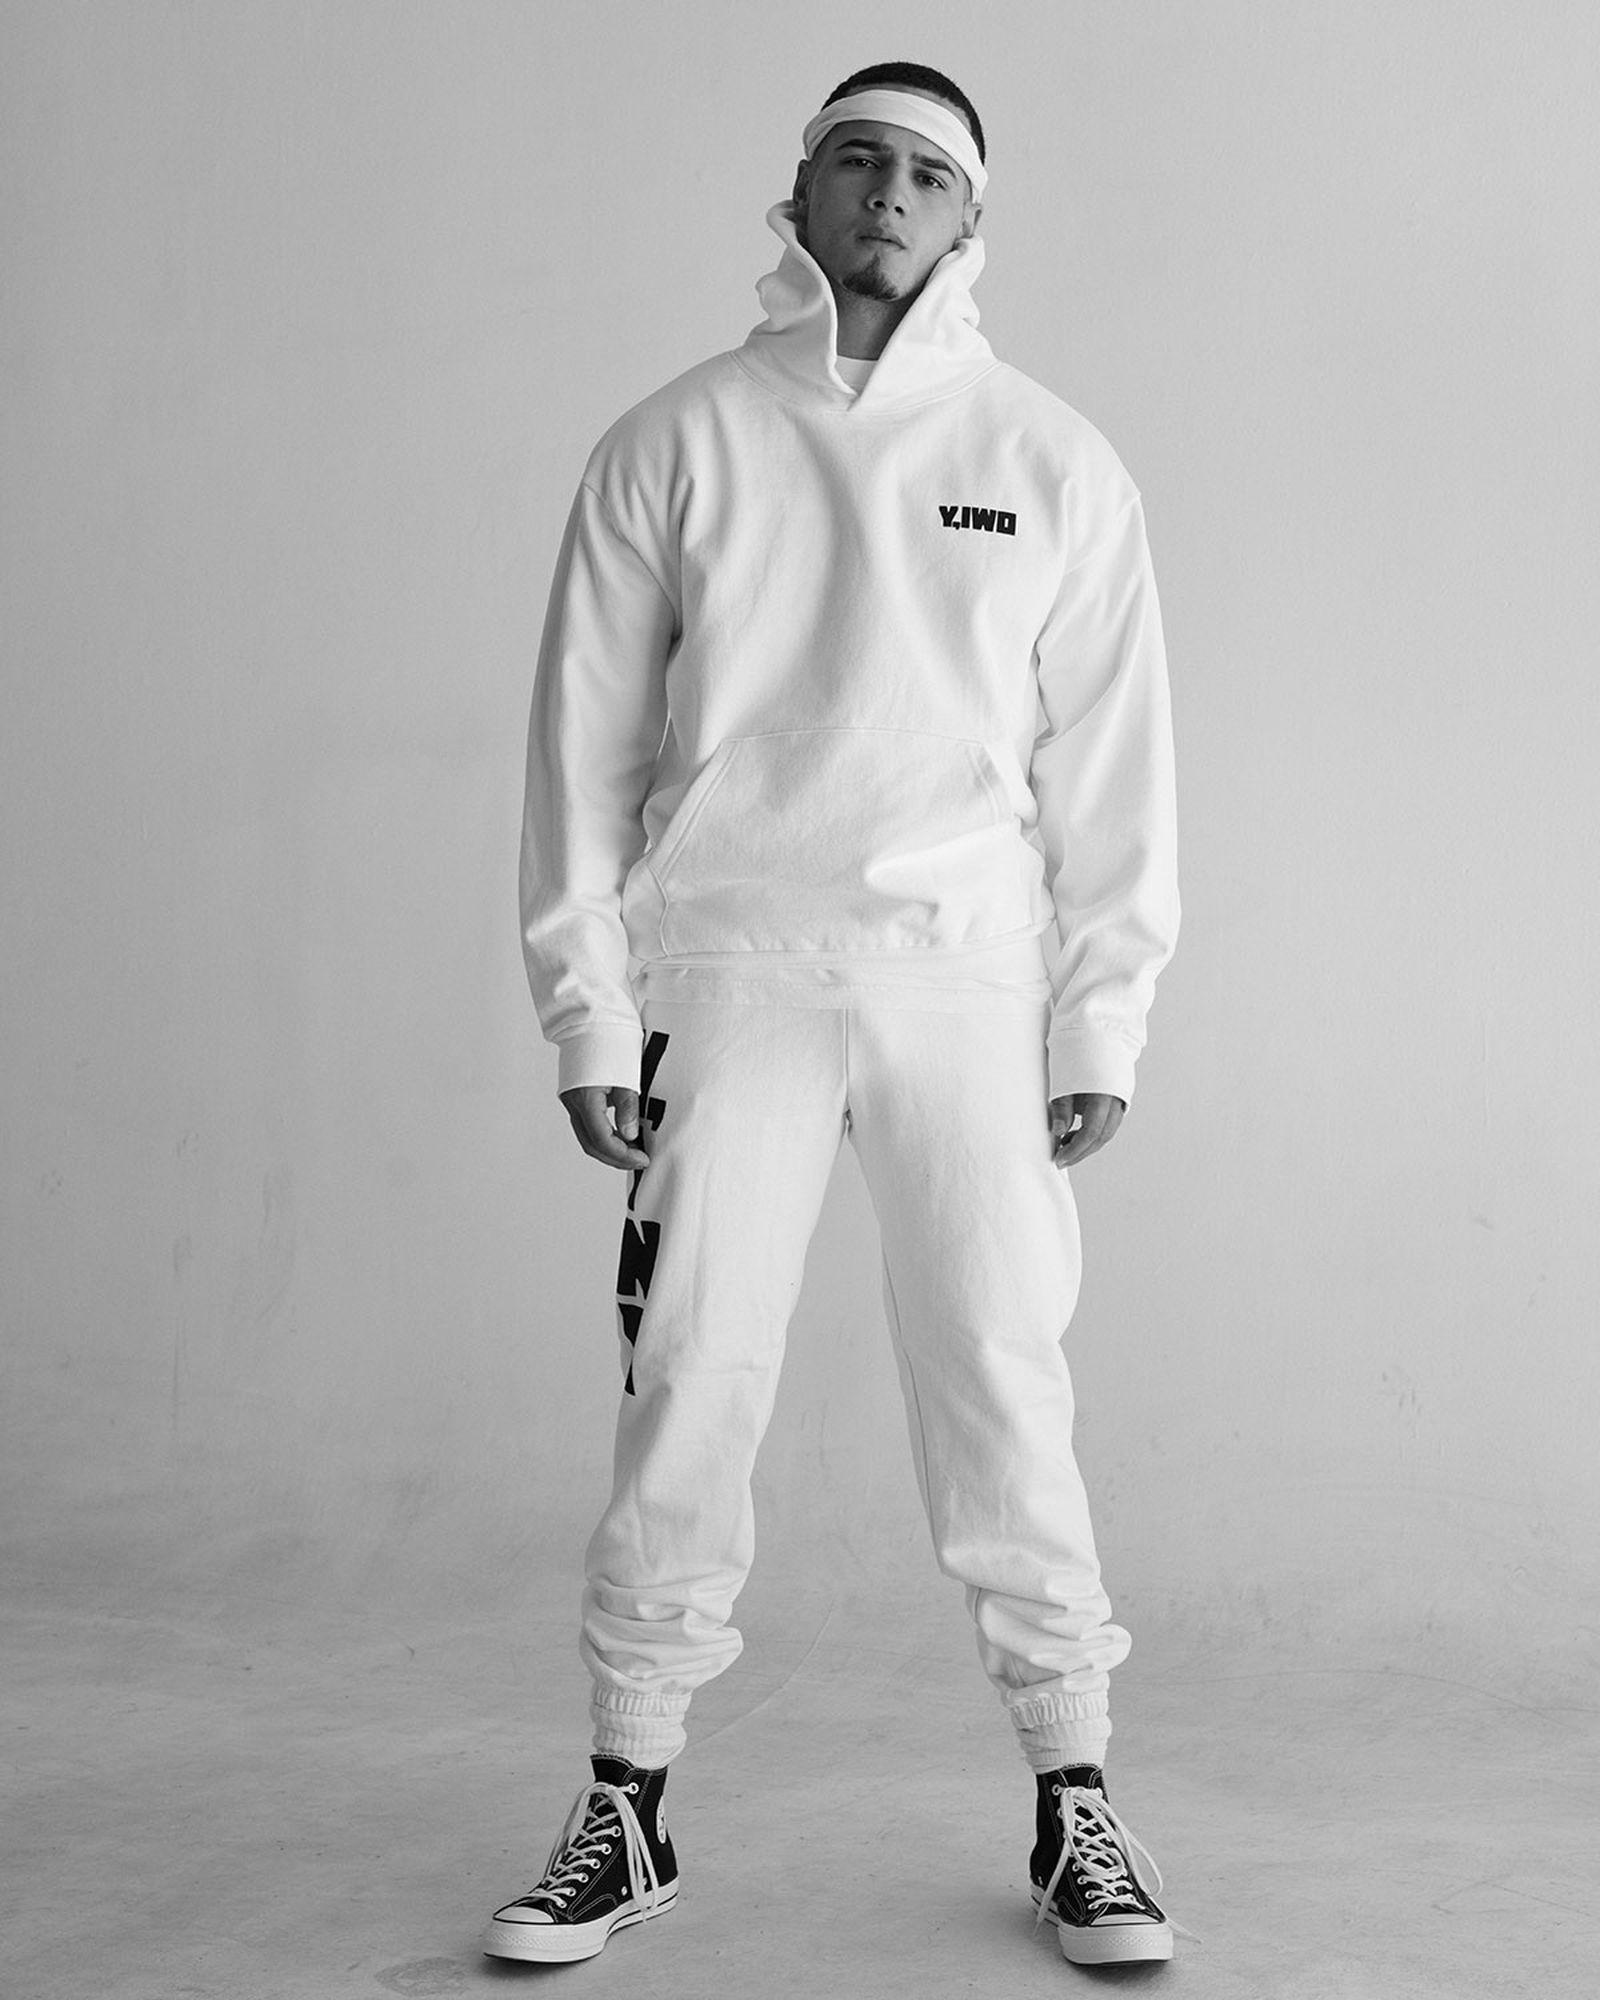 yiwo streetwear brand